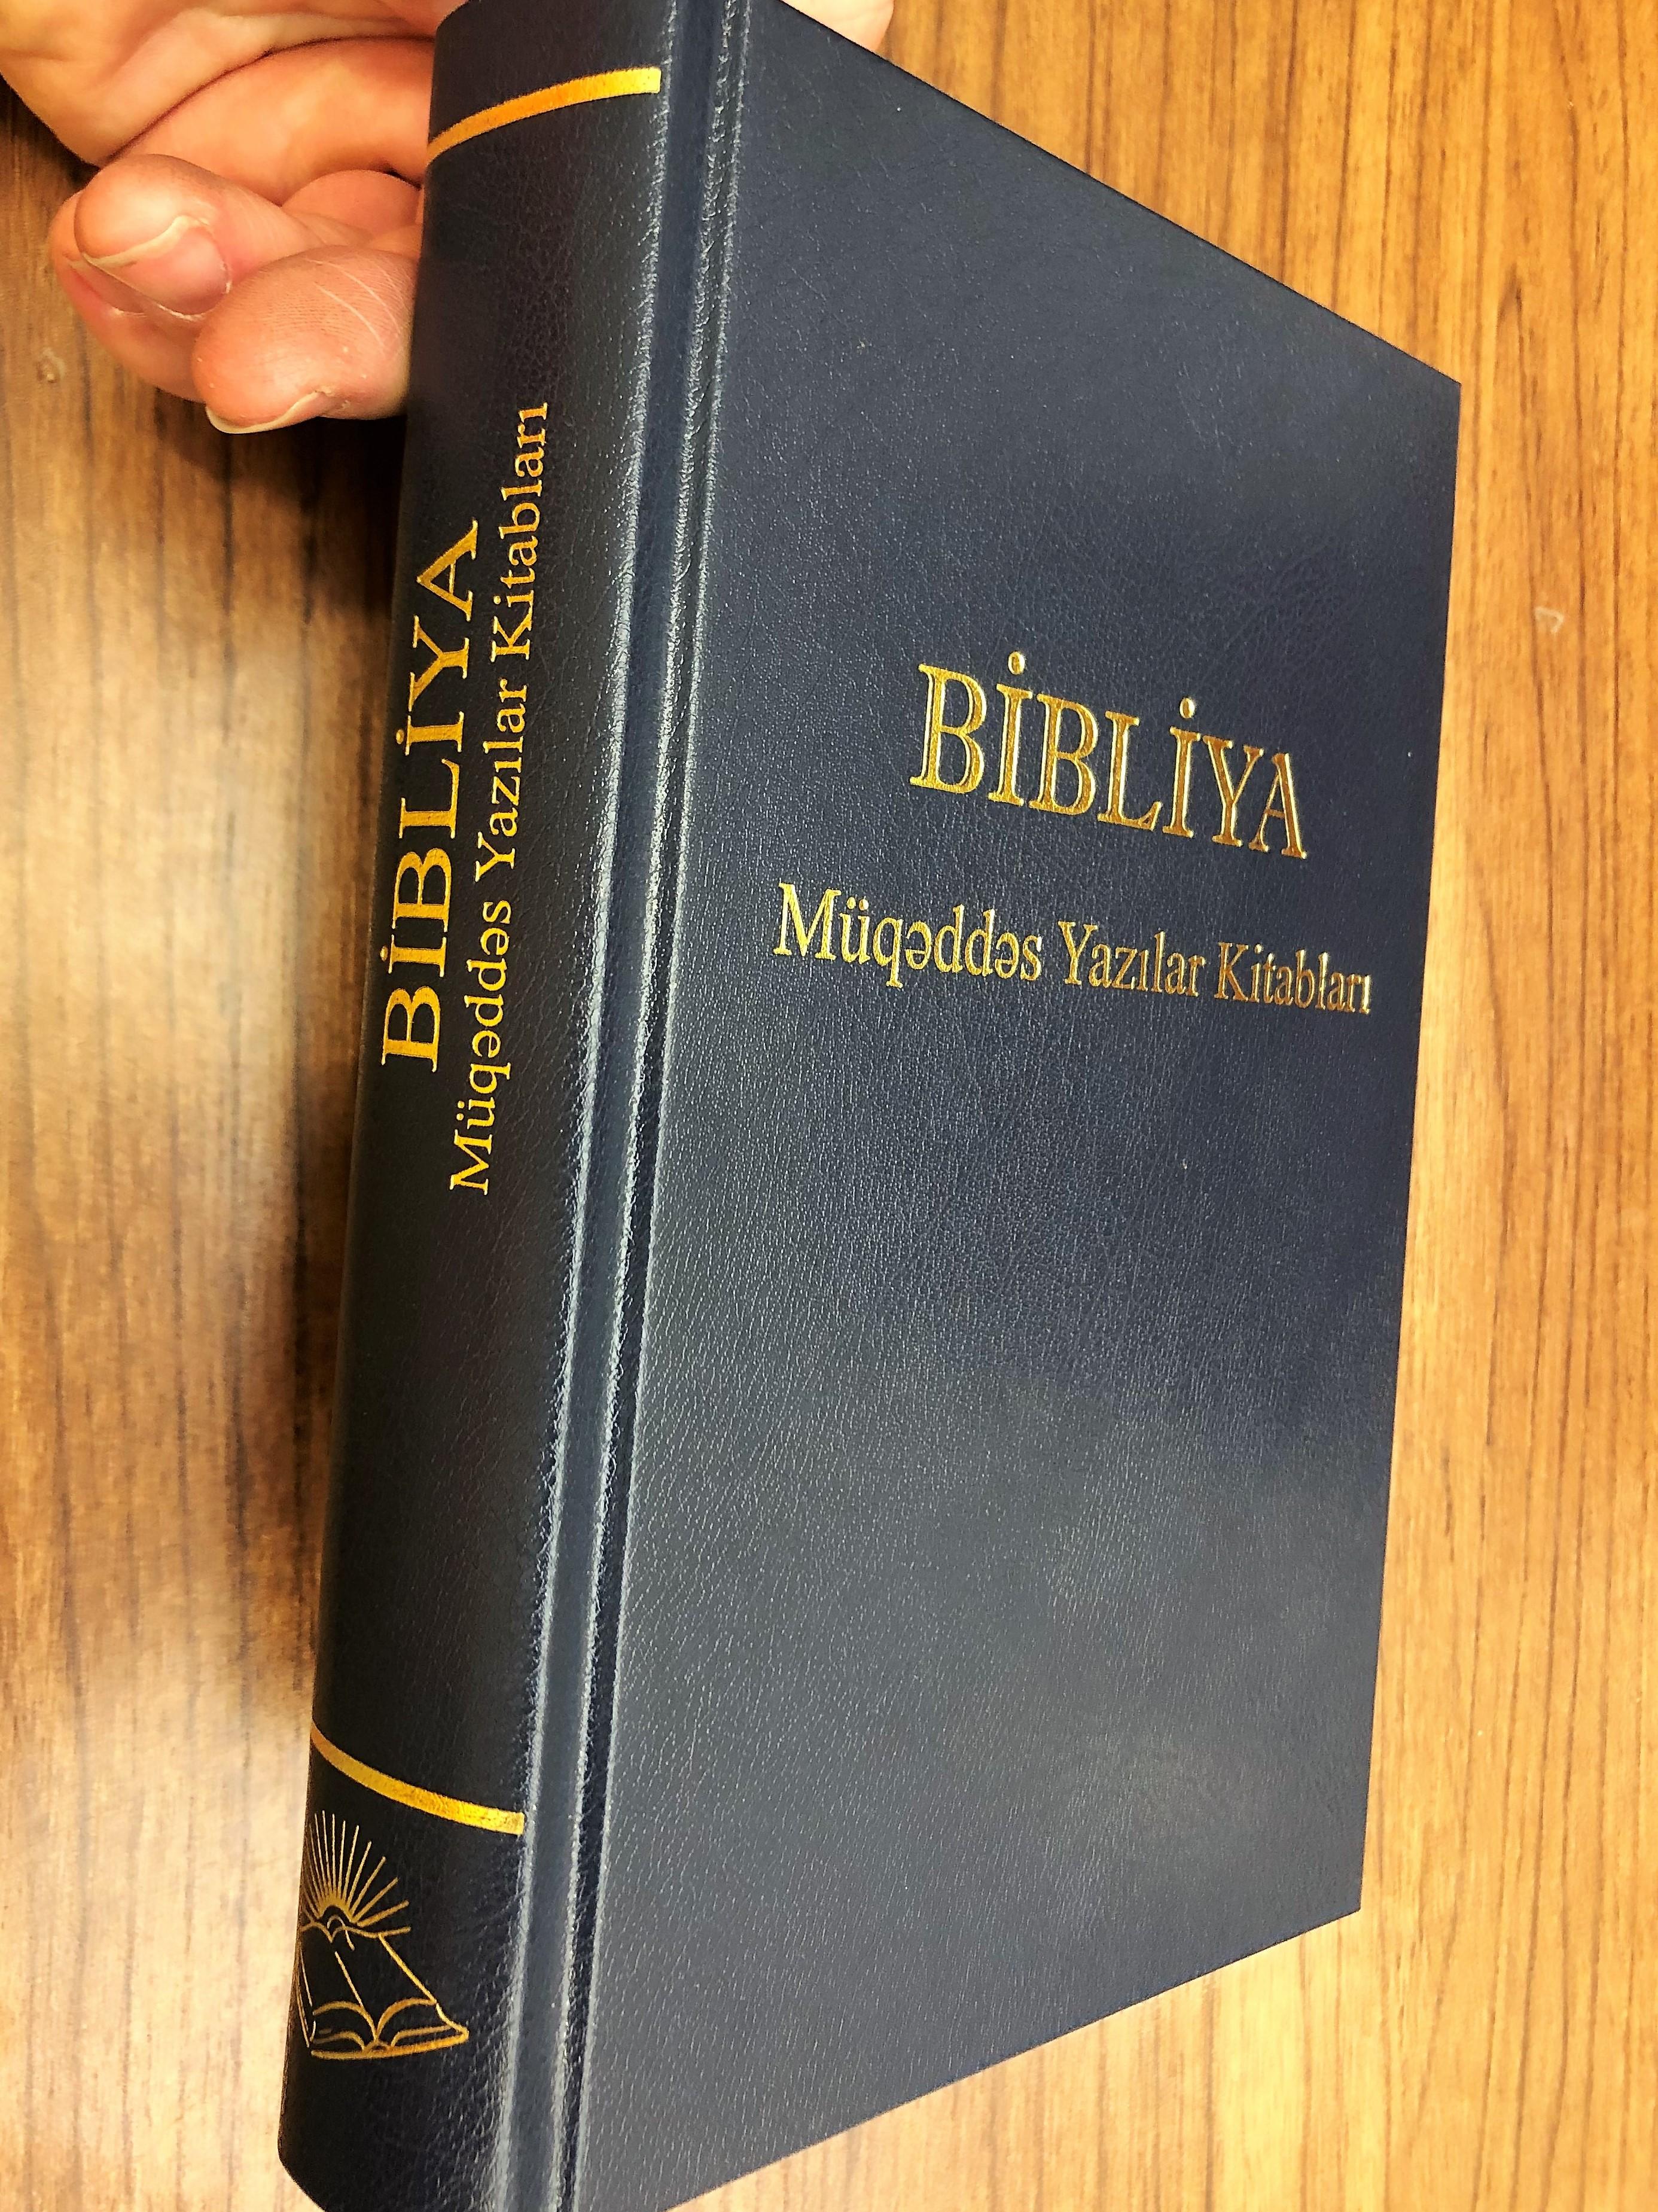 bibliya-azeri-language-with-thumb-index-and-color-maps-text-azerbaijani-latin-a063ti-2-.jpg